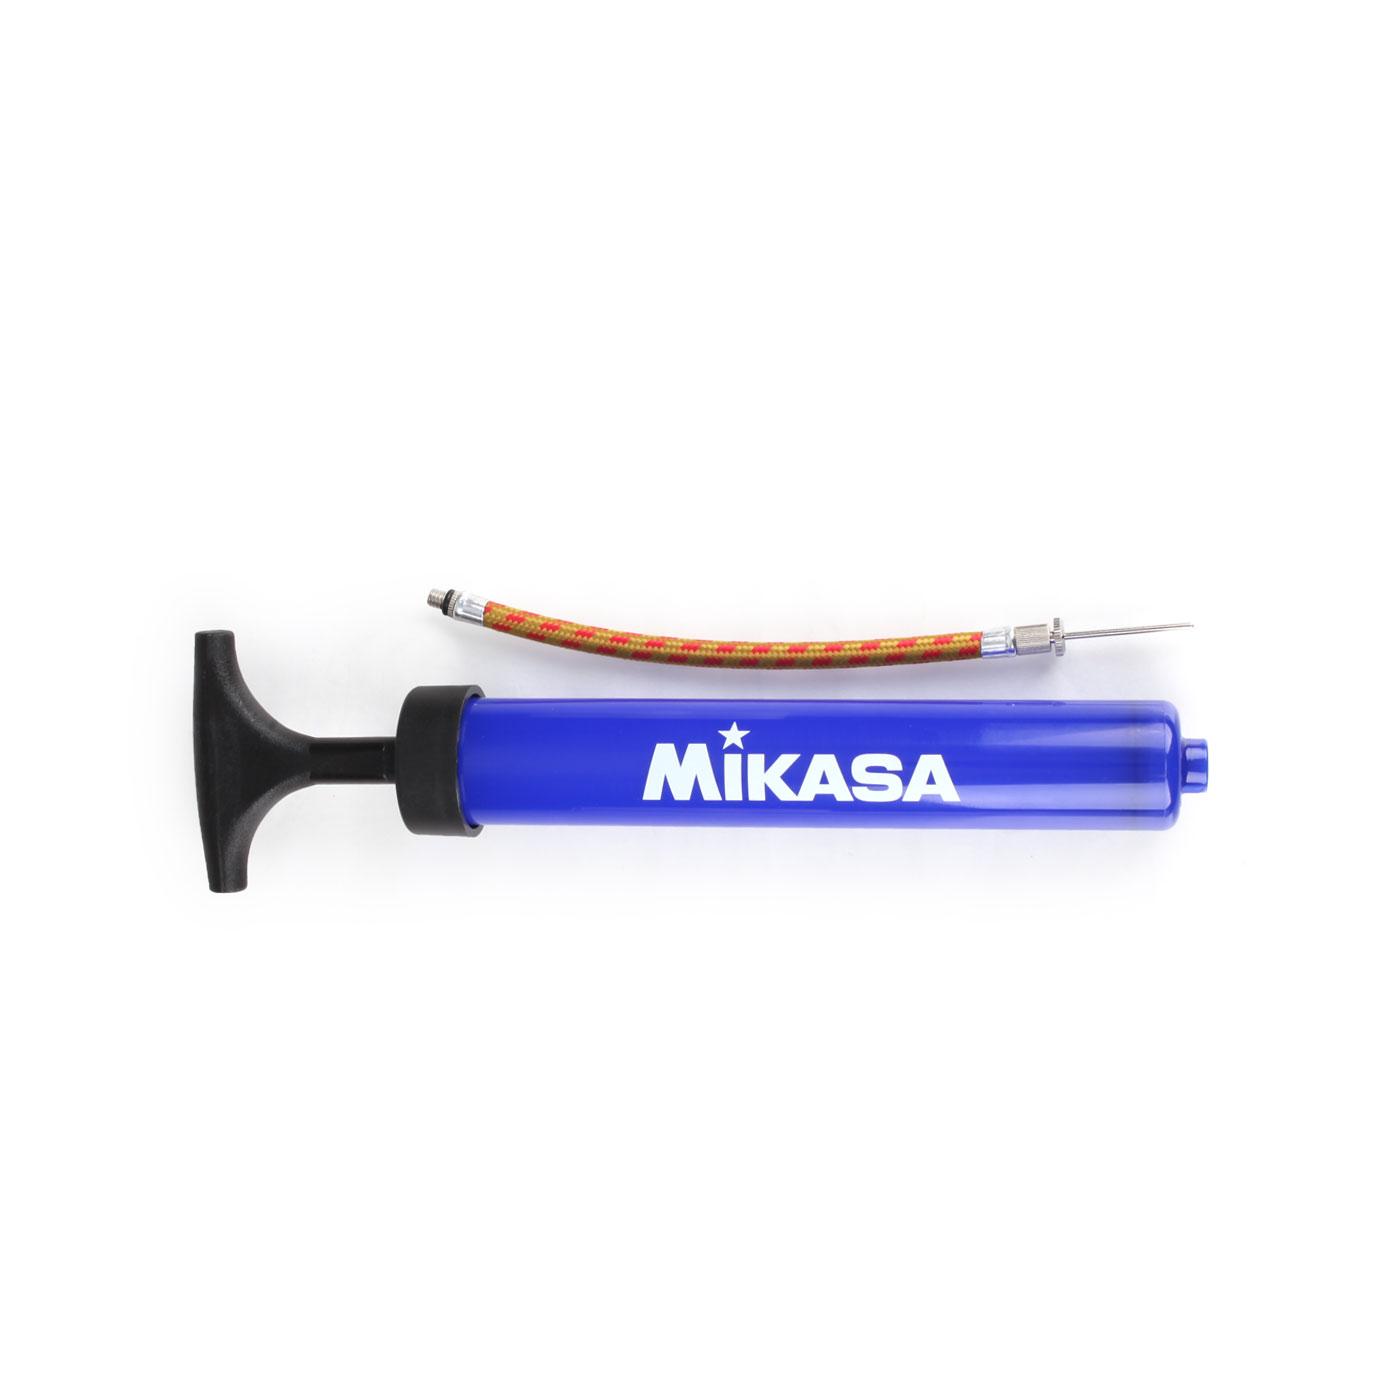 MIKASA 打氣筒 MKPA22 - 藍白